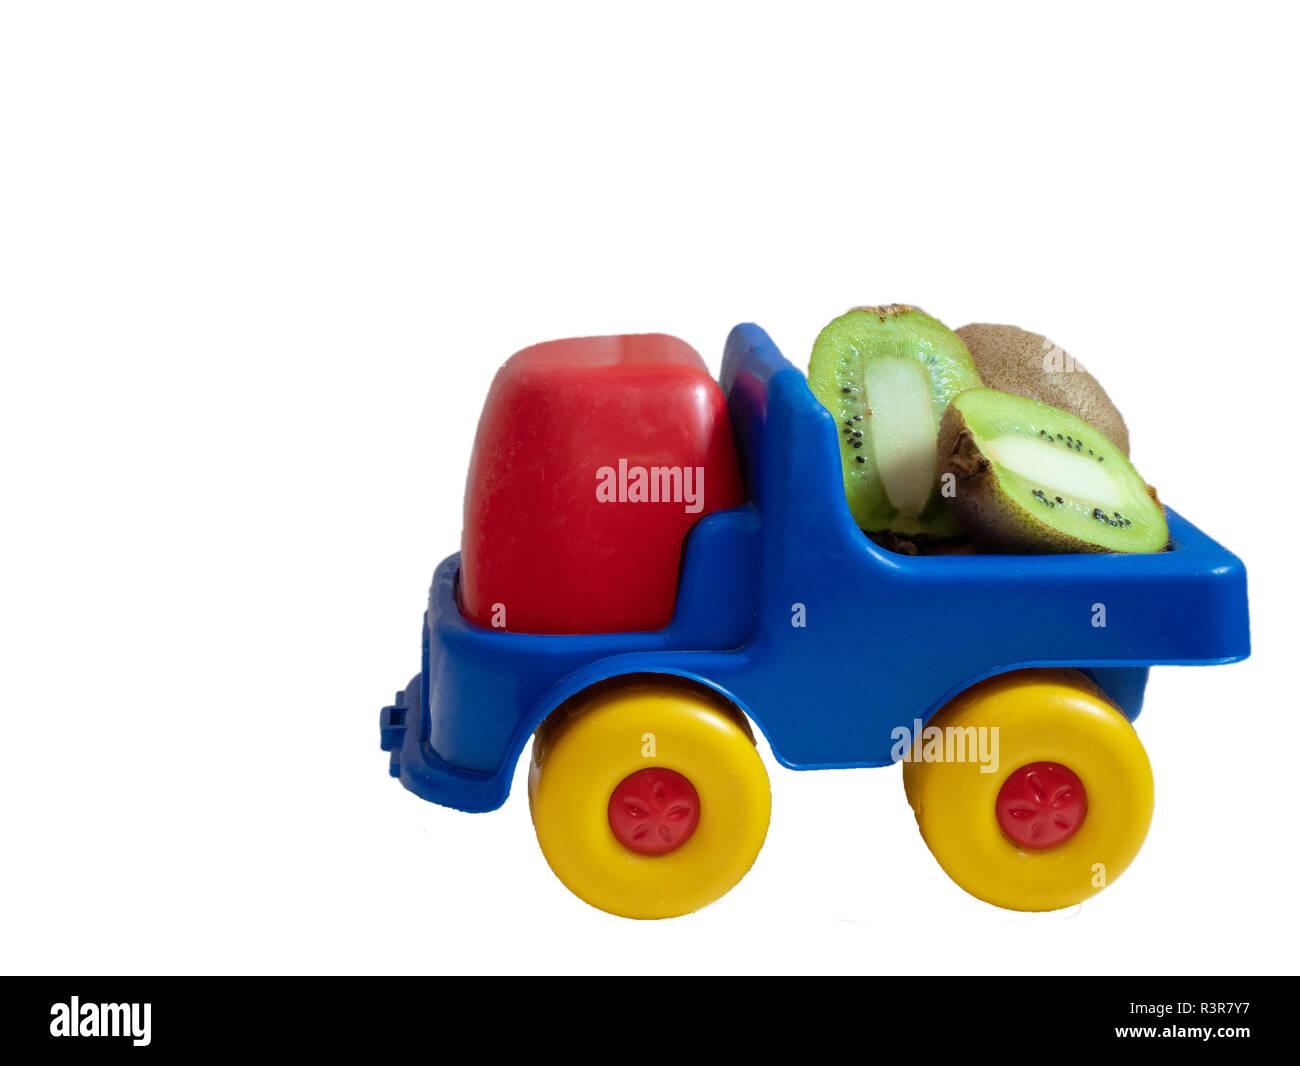 Car Toys Federal Way: Fruit Truck Stock Photos & Fruit Truck Stock Images